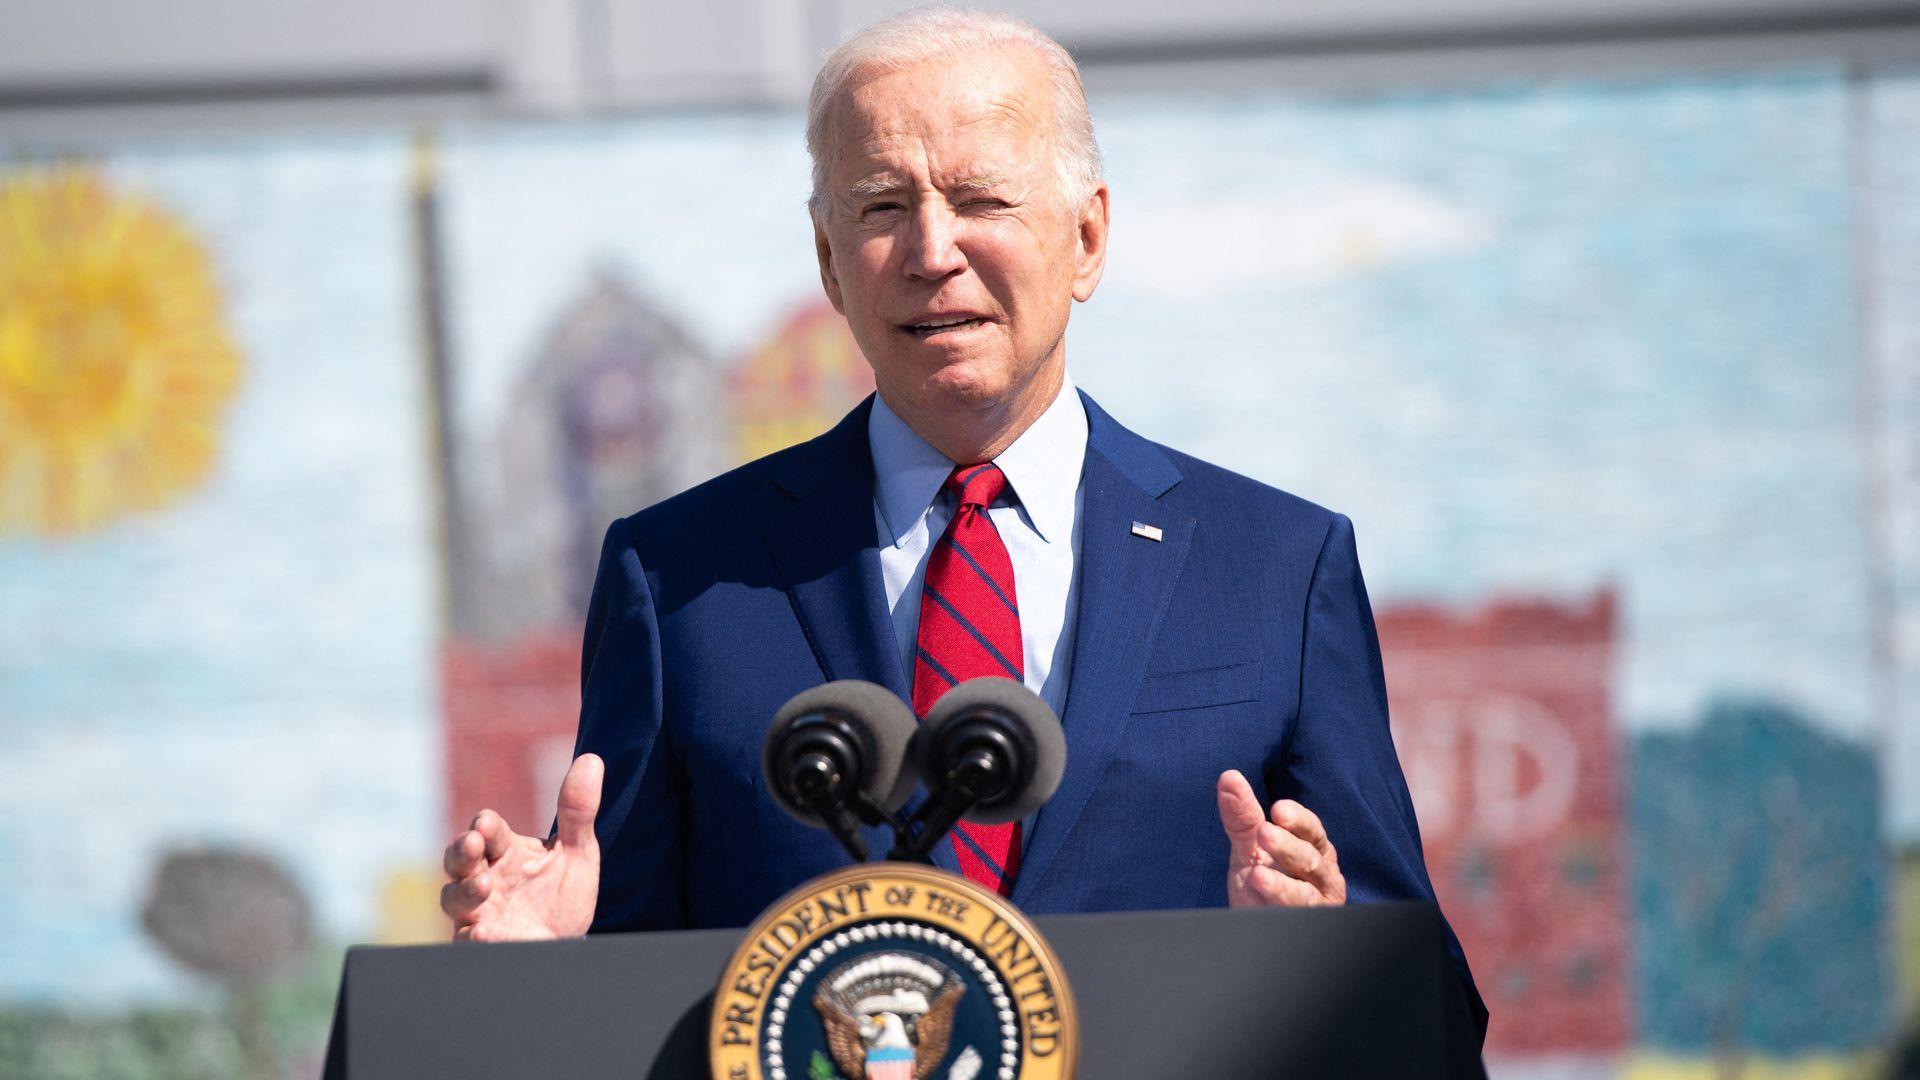 President Joe Biden speaks at a podium outdoors.